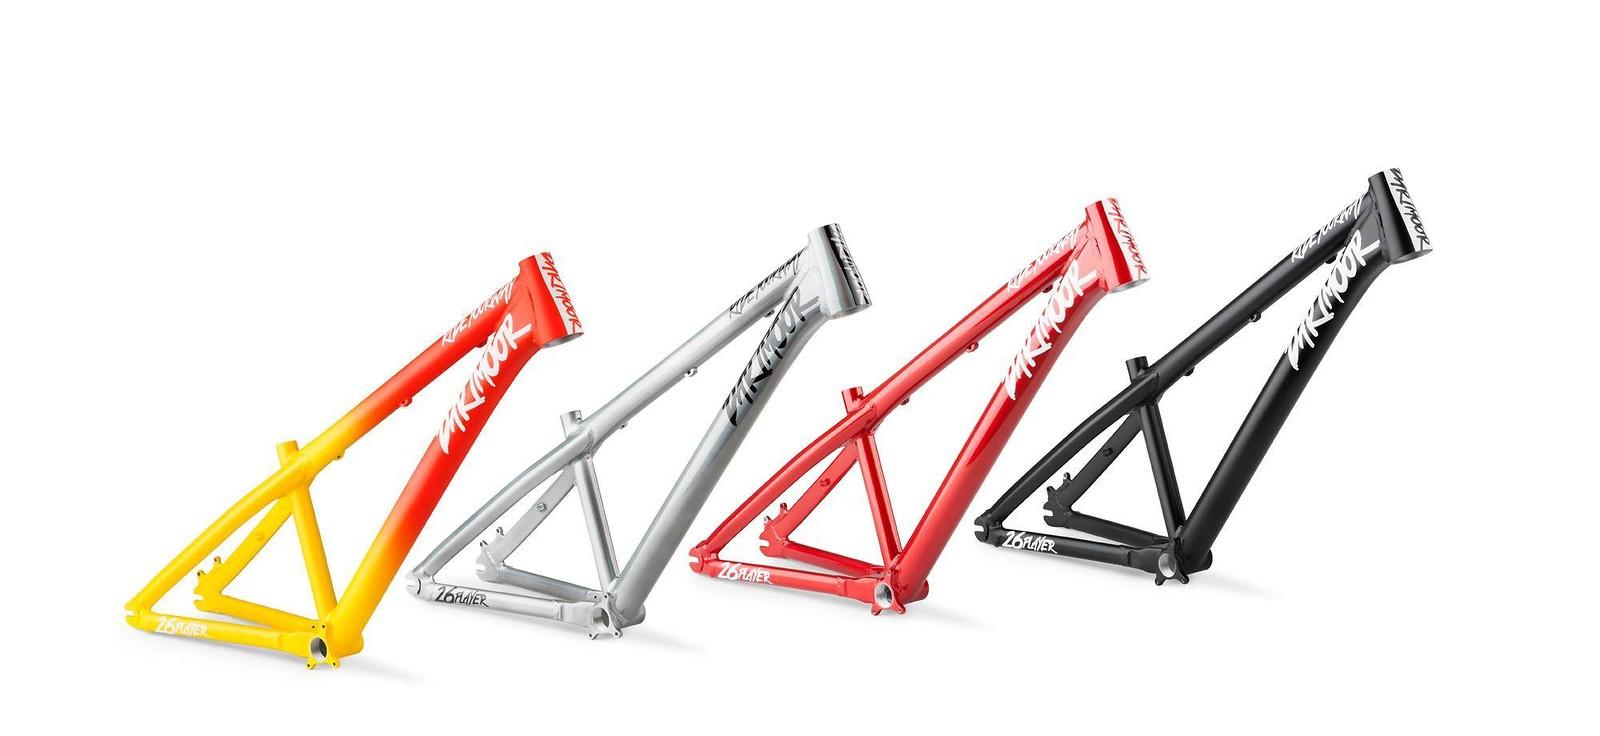 Two6Players - Dartmoor Bikes - Mountain Biking Pictures - Vital MTB